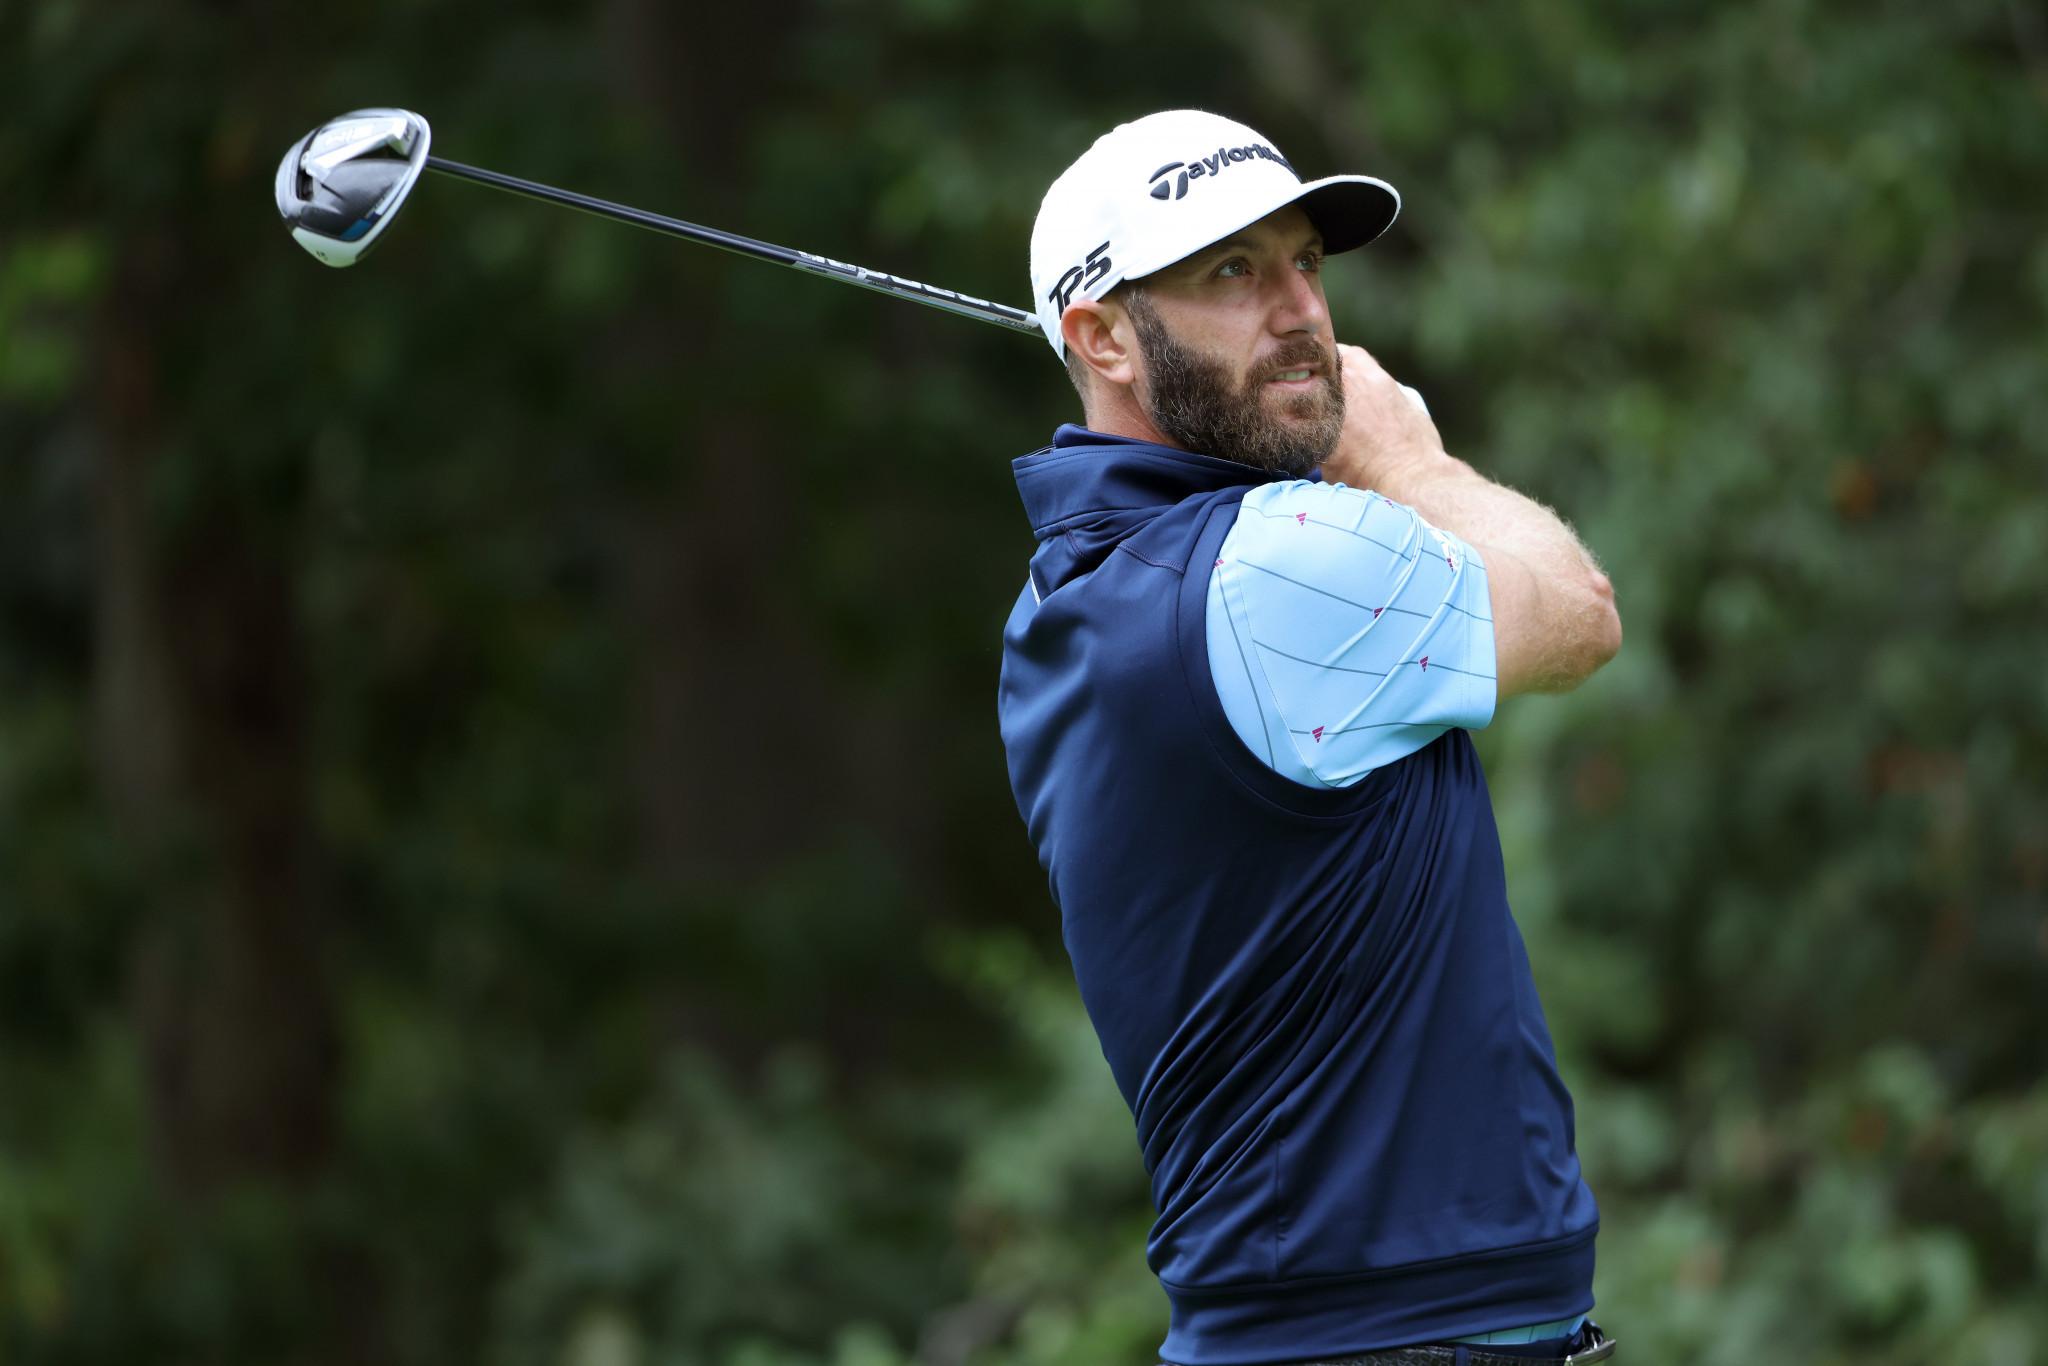 World number one golfer Dustin Johnson has tested positive for coronavirus ©Getty Images